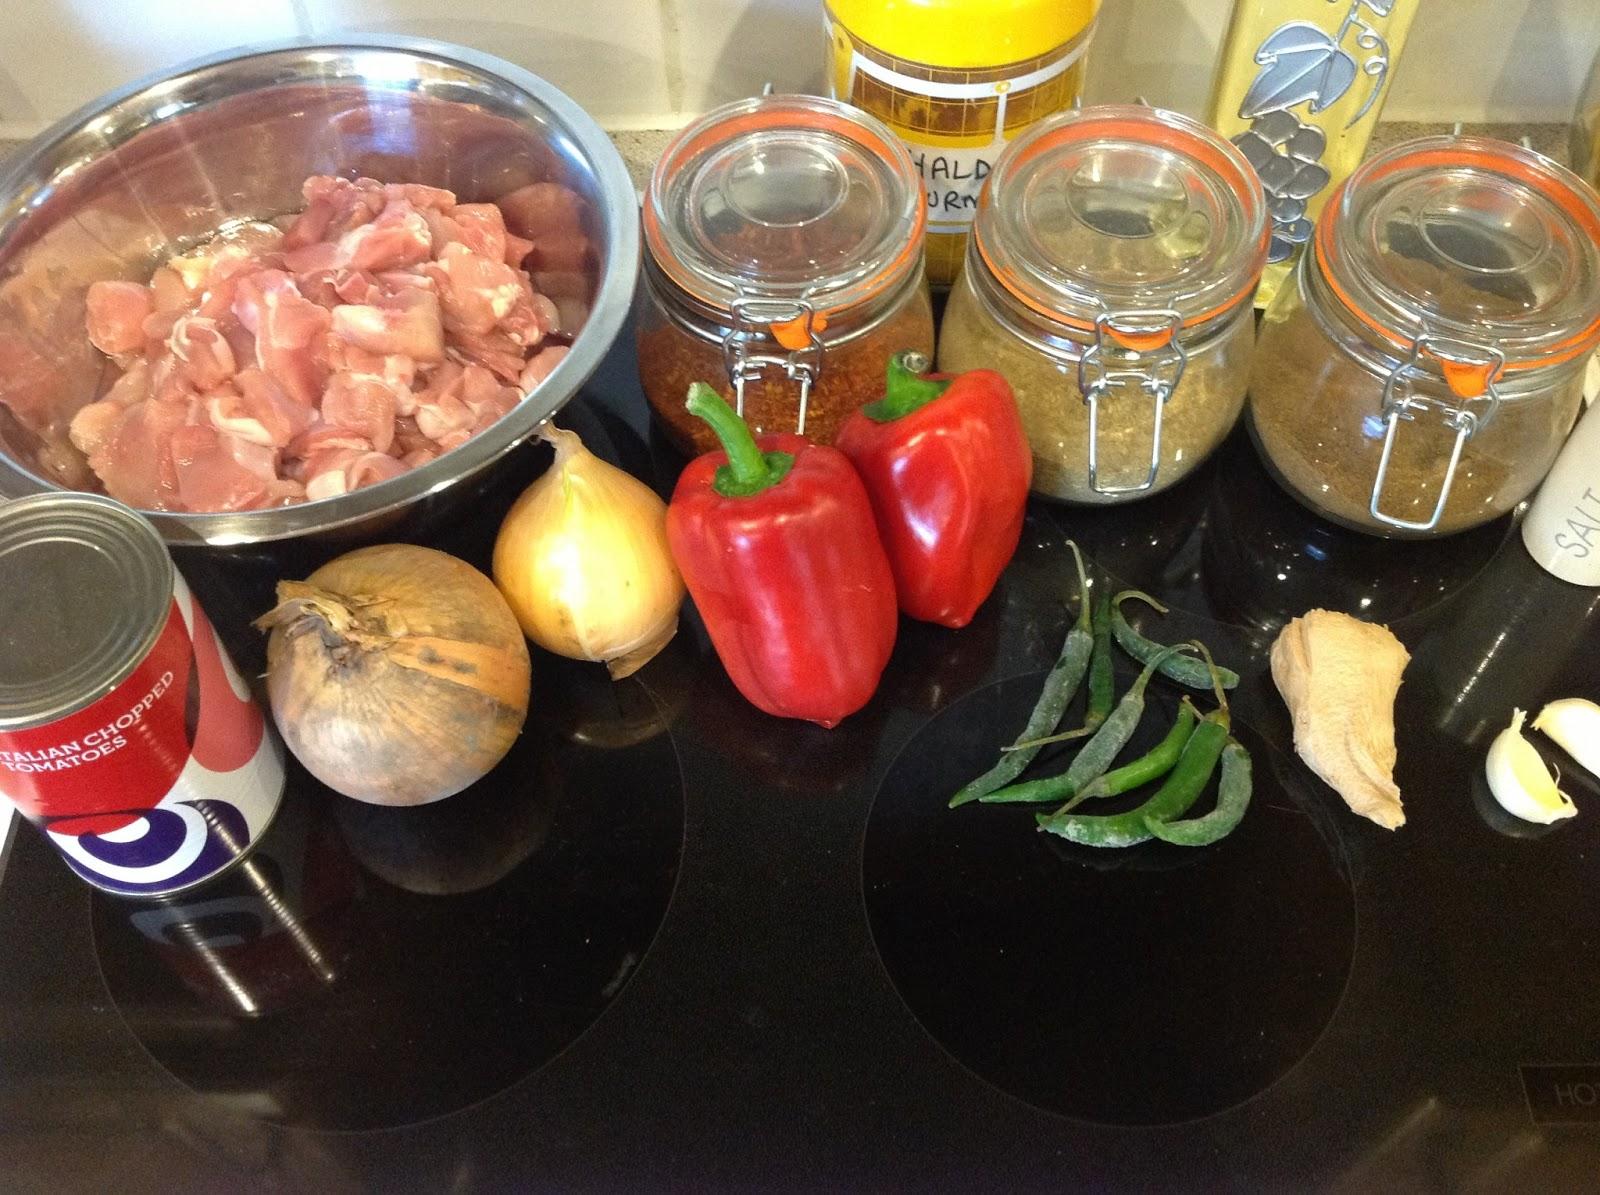 Boneless Chicken Pieces 2 Chopped Tomatoes Tin 3 Onions 4 Red Bell  Peppers 5 Green Chillies 6 Fresh Garlic 7 Fresh Ginger 8 Salt 9 Ground  Cumin